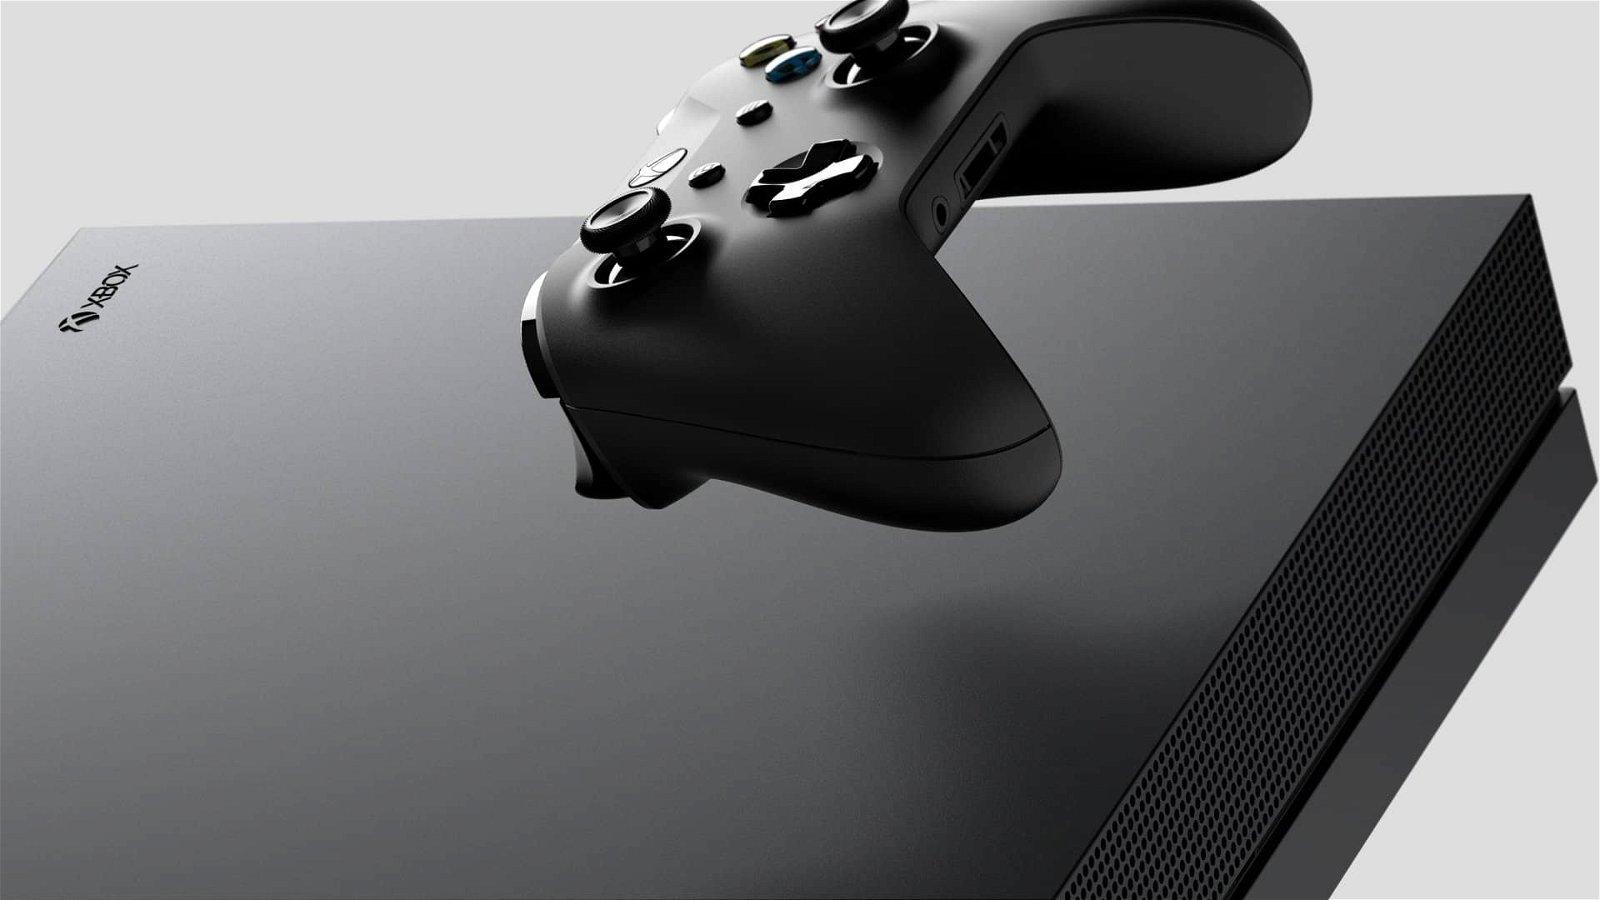 Microsoft Announces Financing Plan Xbox All Access 1